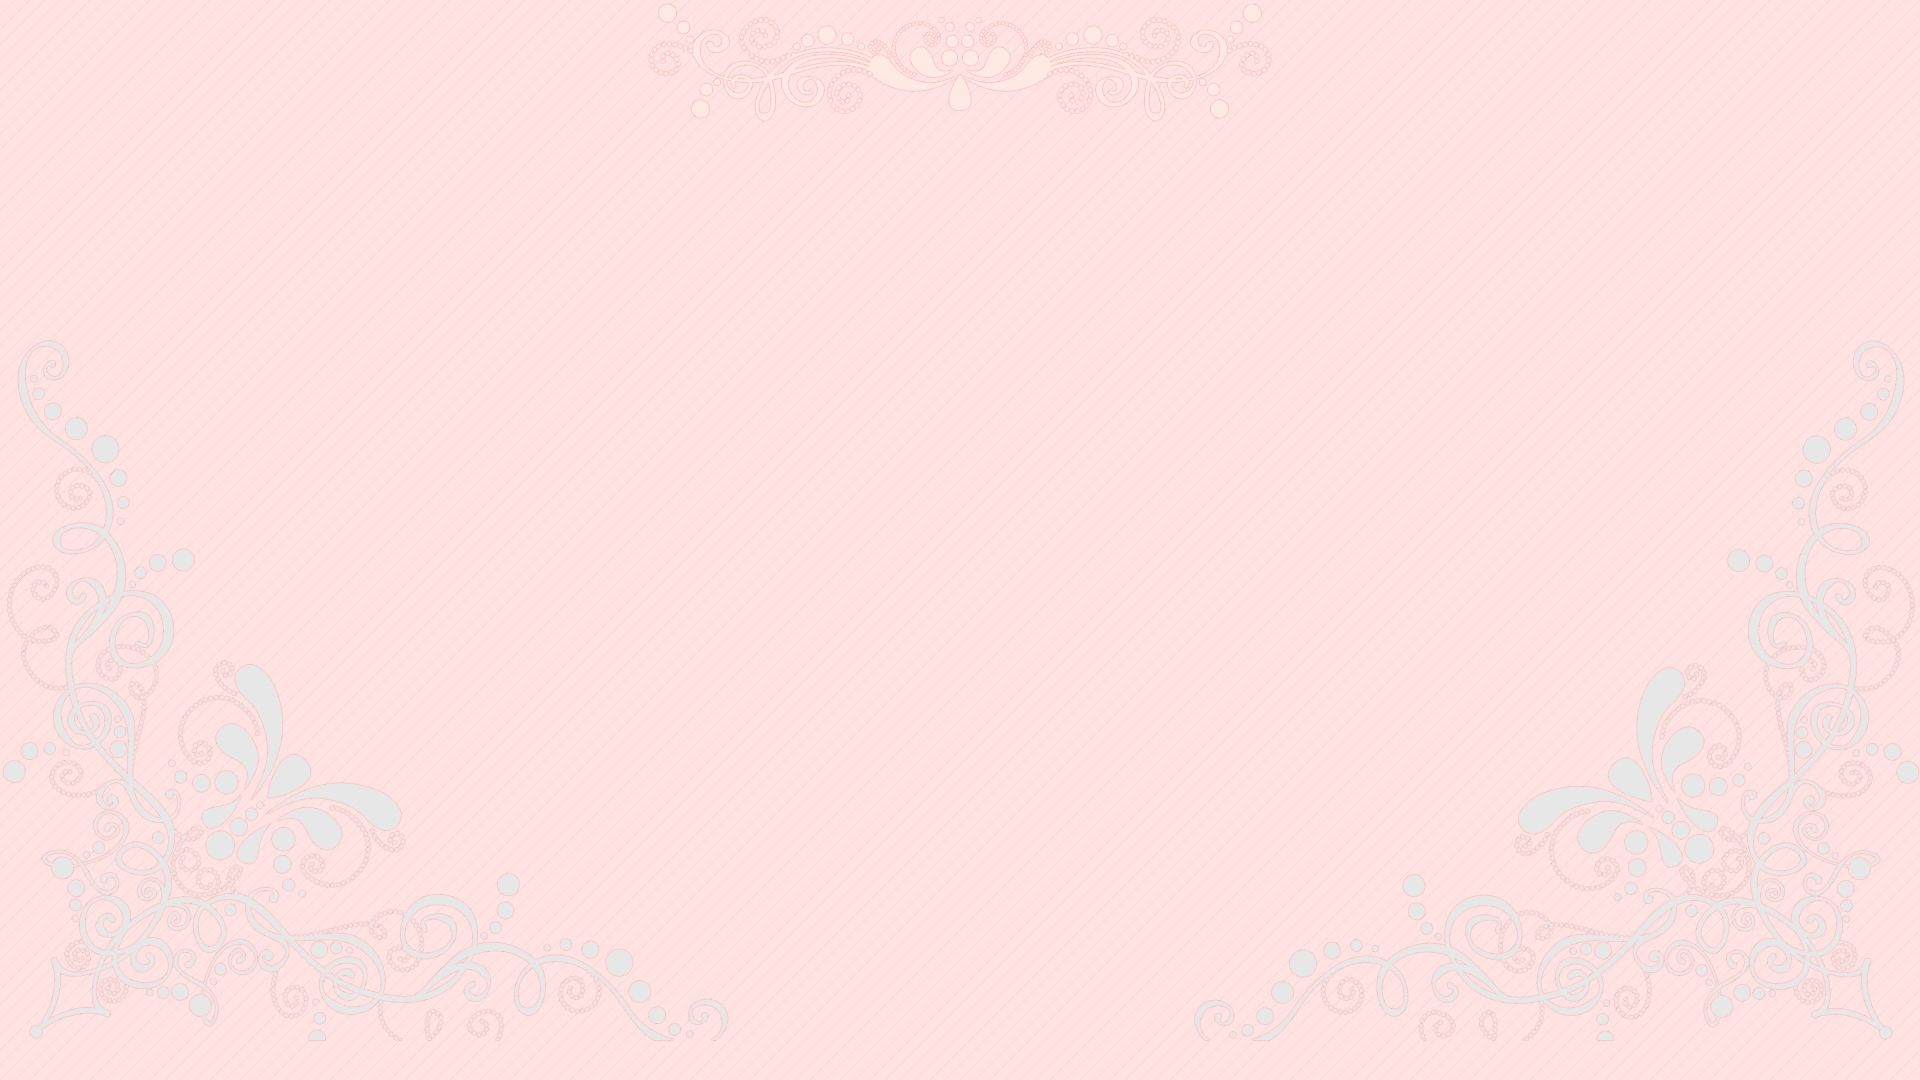 Hd Desktop Background Pastel Com Imagens 1080p Of Wallpaper